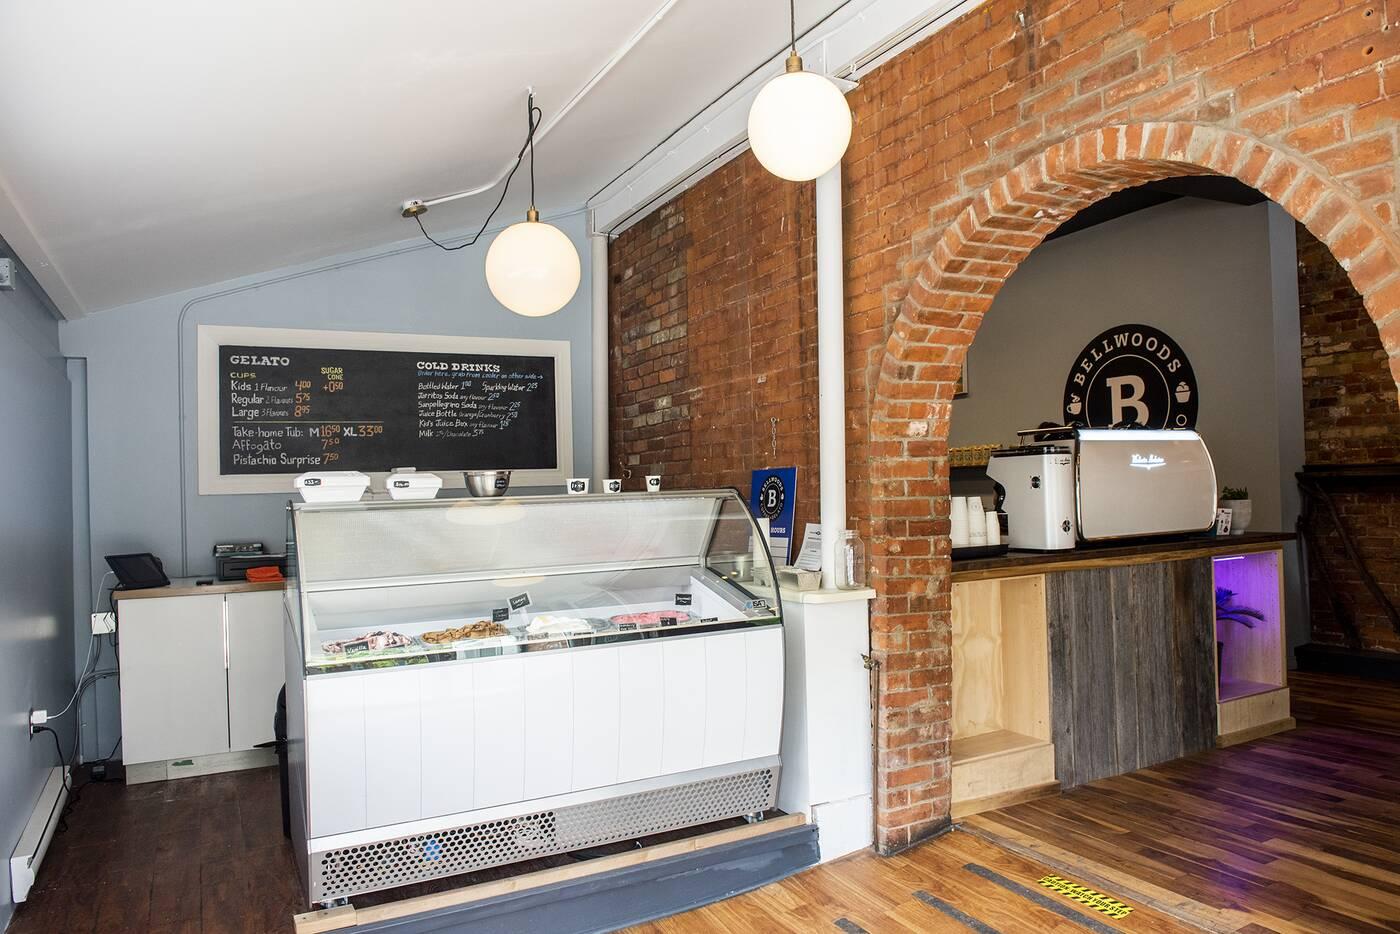 Bellwoods Coffee Gelato Toronto